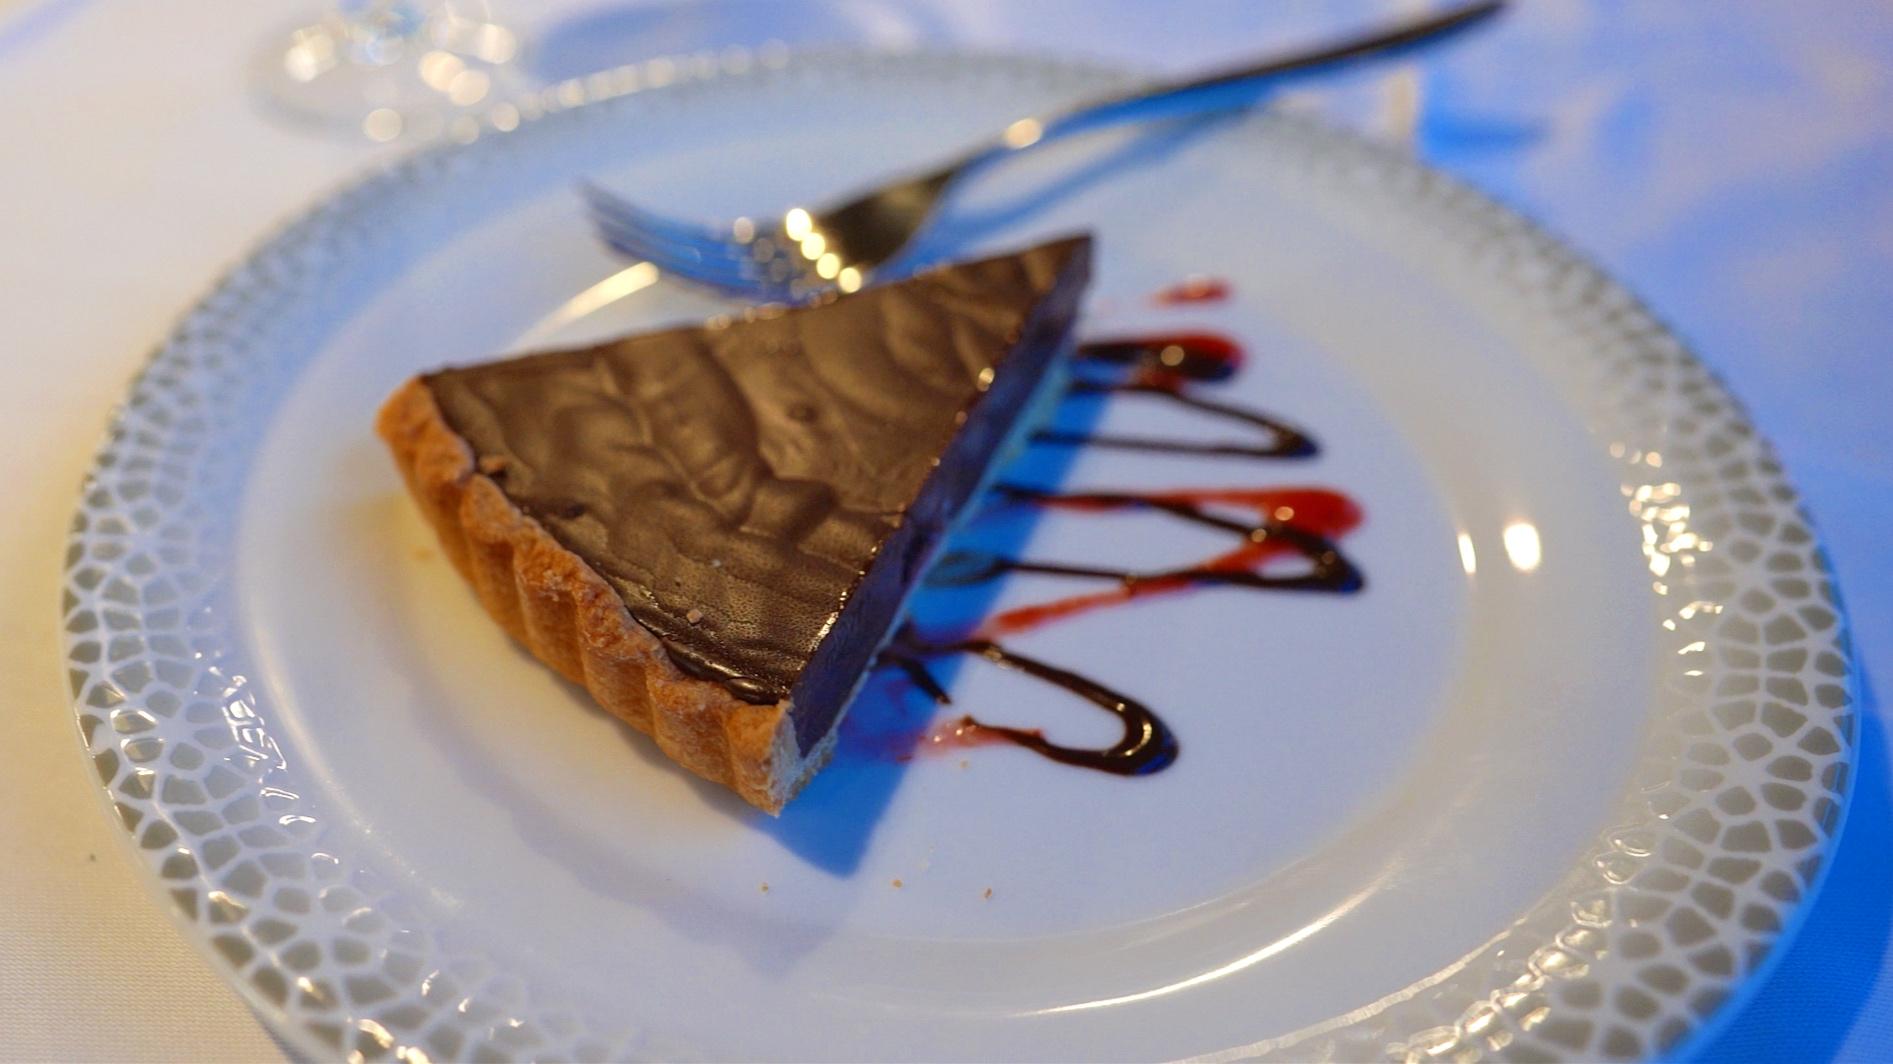 Chocolate pie to finish